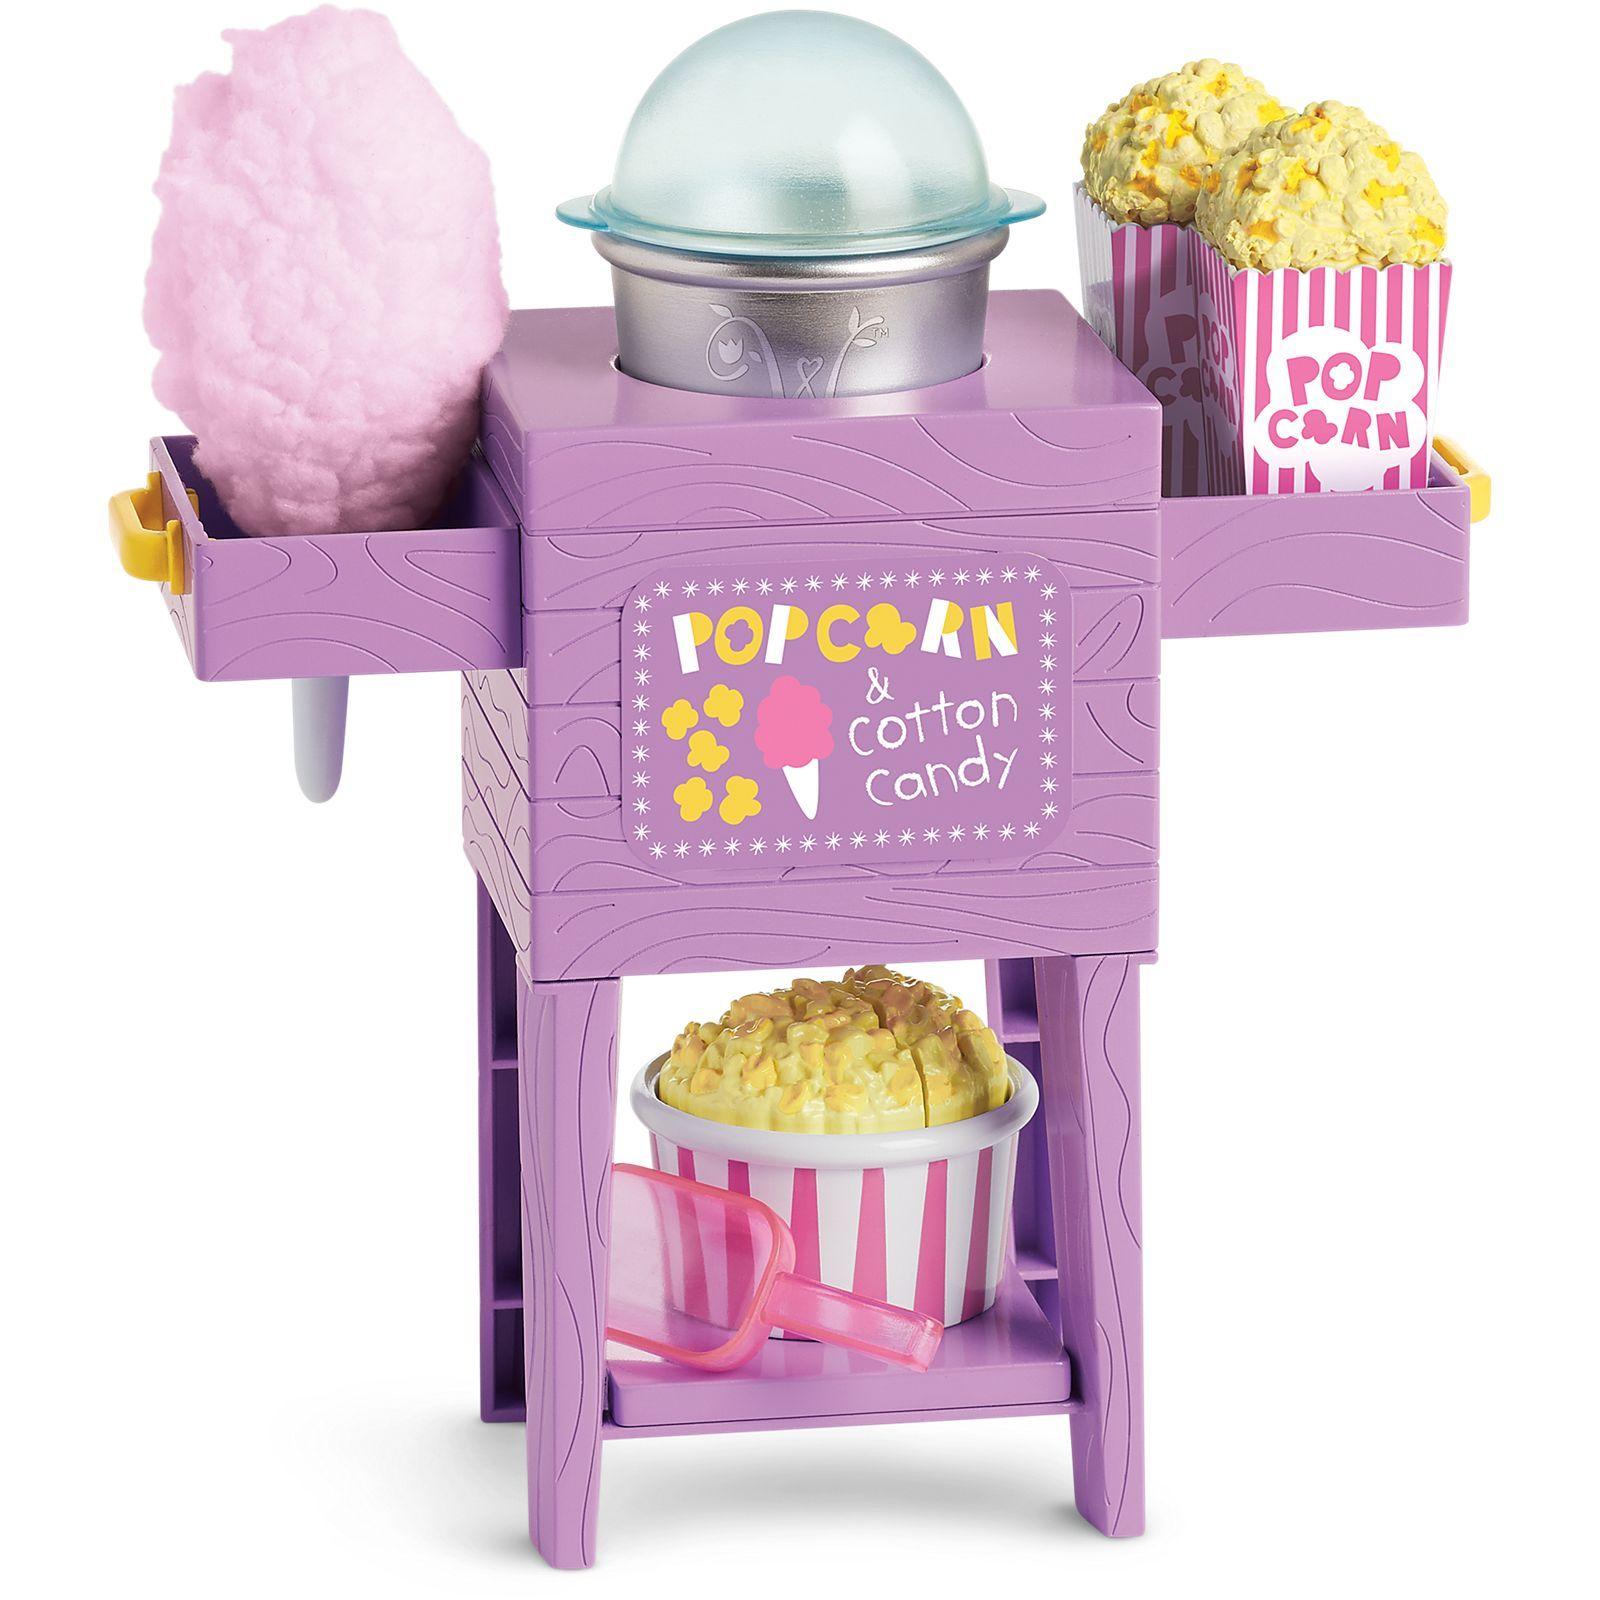 Popcorn u cotton candy cart american girl life american girl